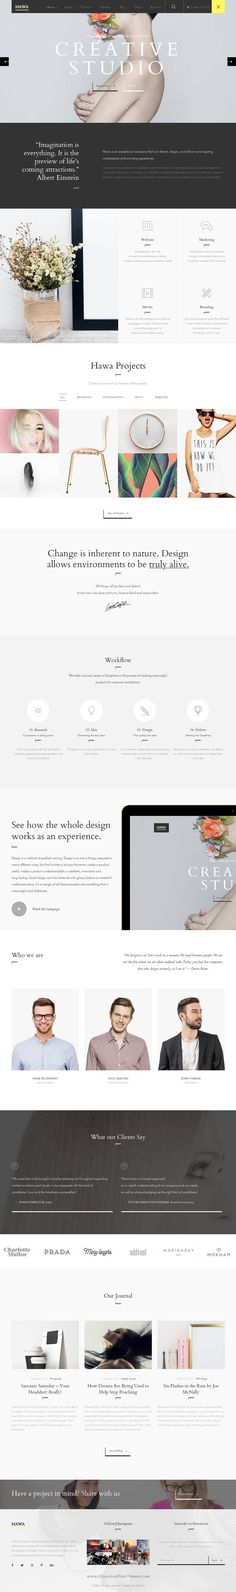 Hawa is Hot Creative responsive WordPress Theme for multipurpose #website. #creative #startup Download Now!